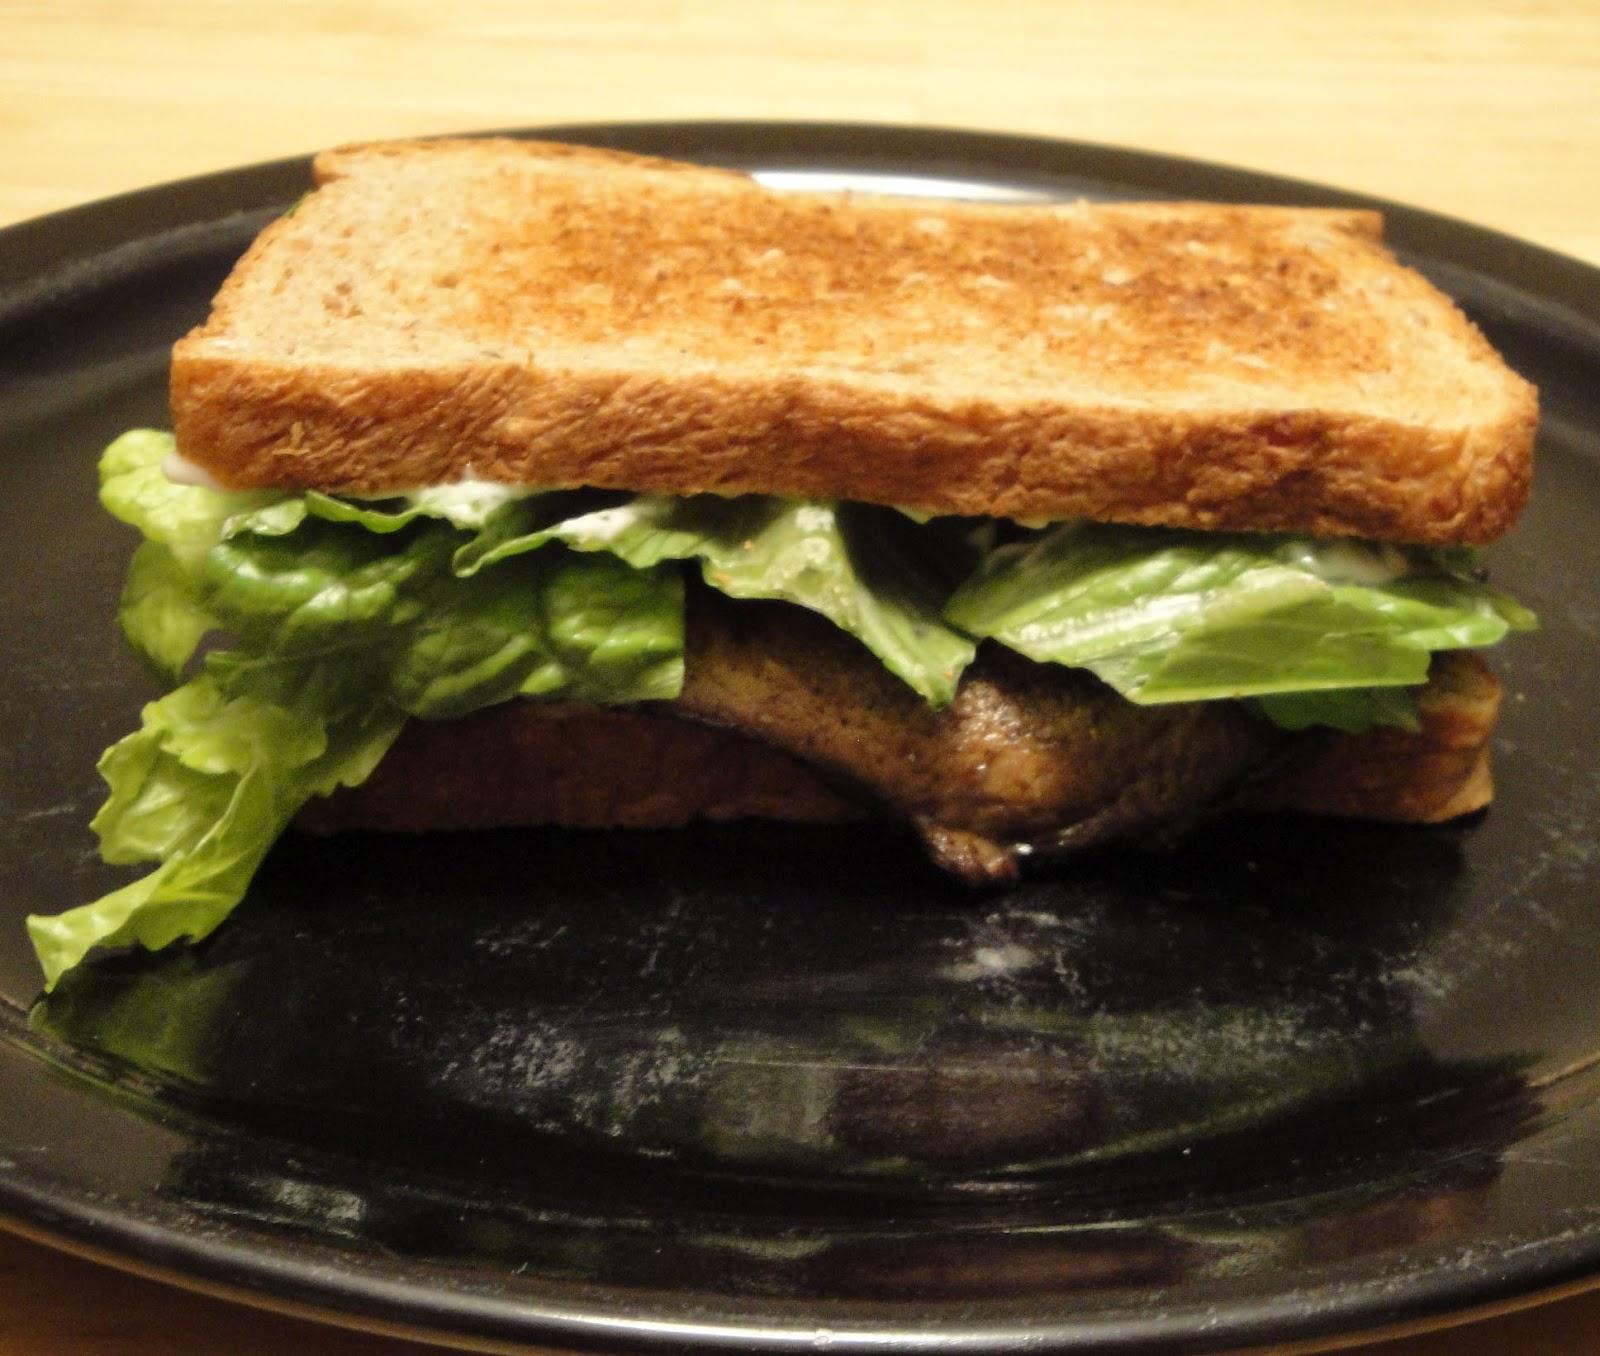 Christine's Pantry: Portabella Mushroom Burger